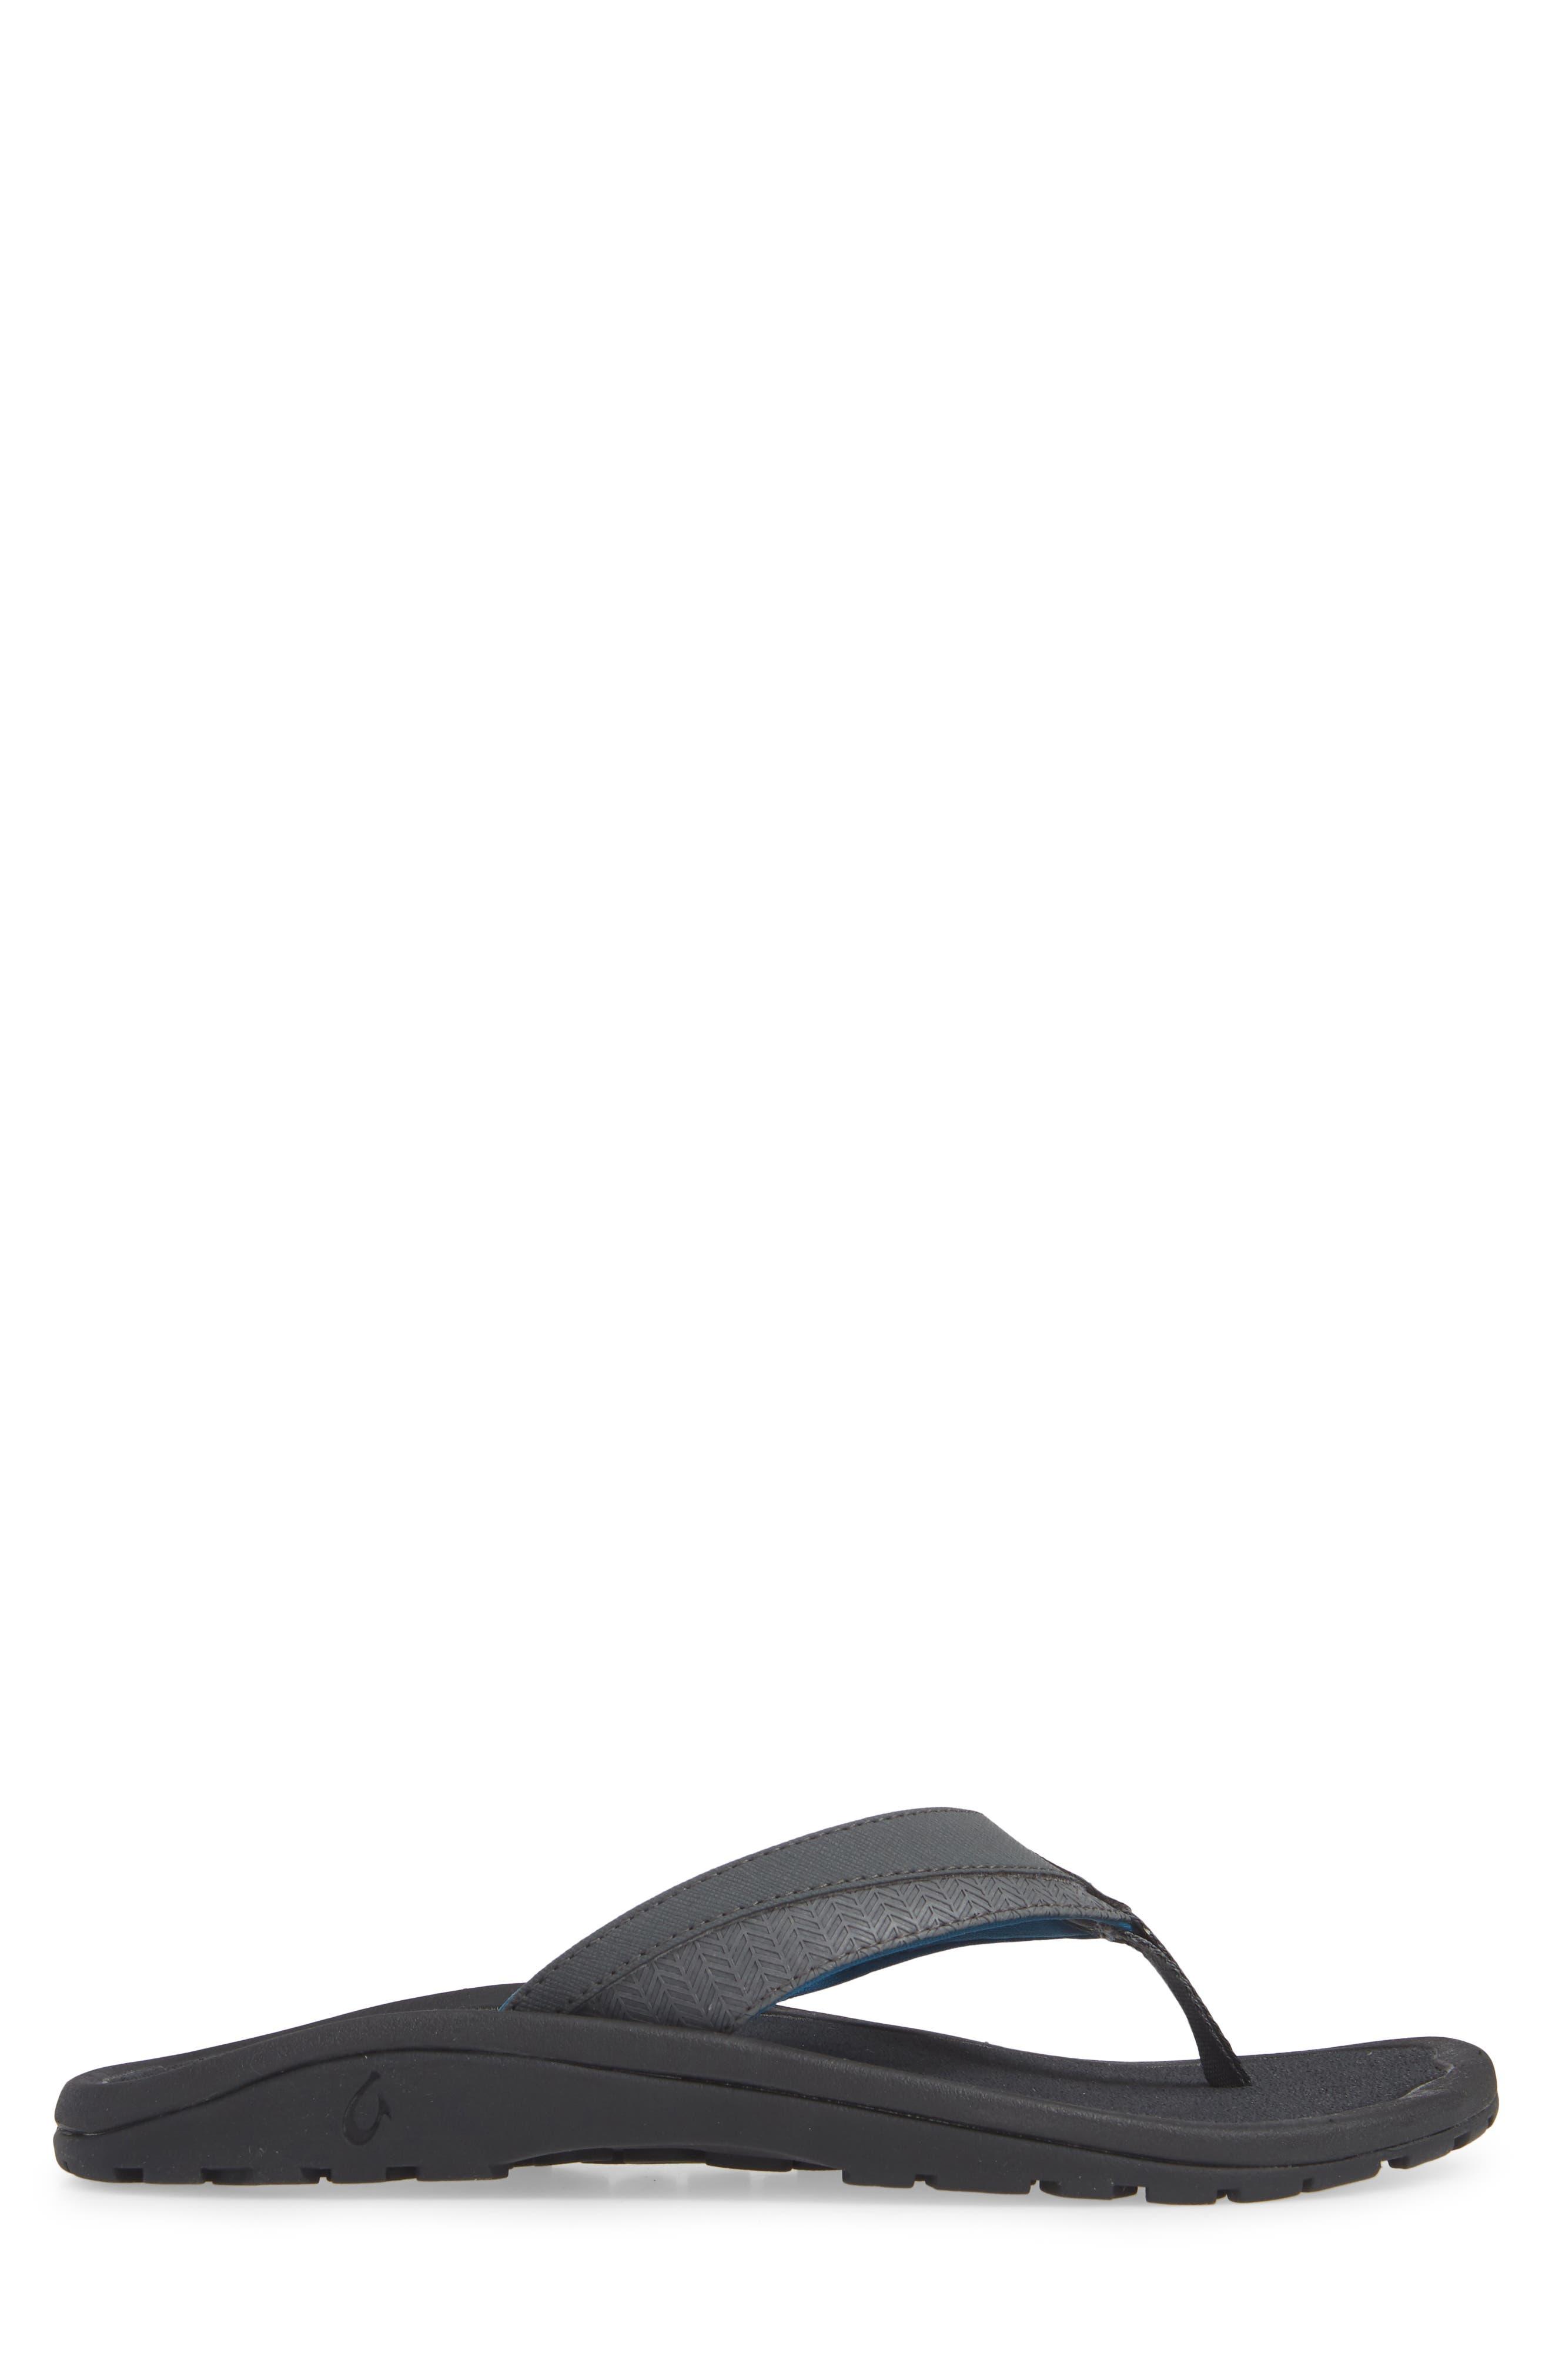 OLUKAI, 'Ohana Koa' Flip Flop, Alternate thumbnail 3, color, DARK SHADOW